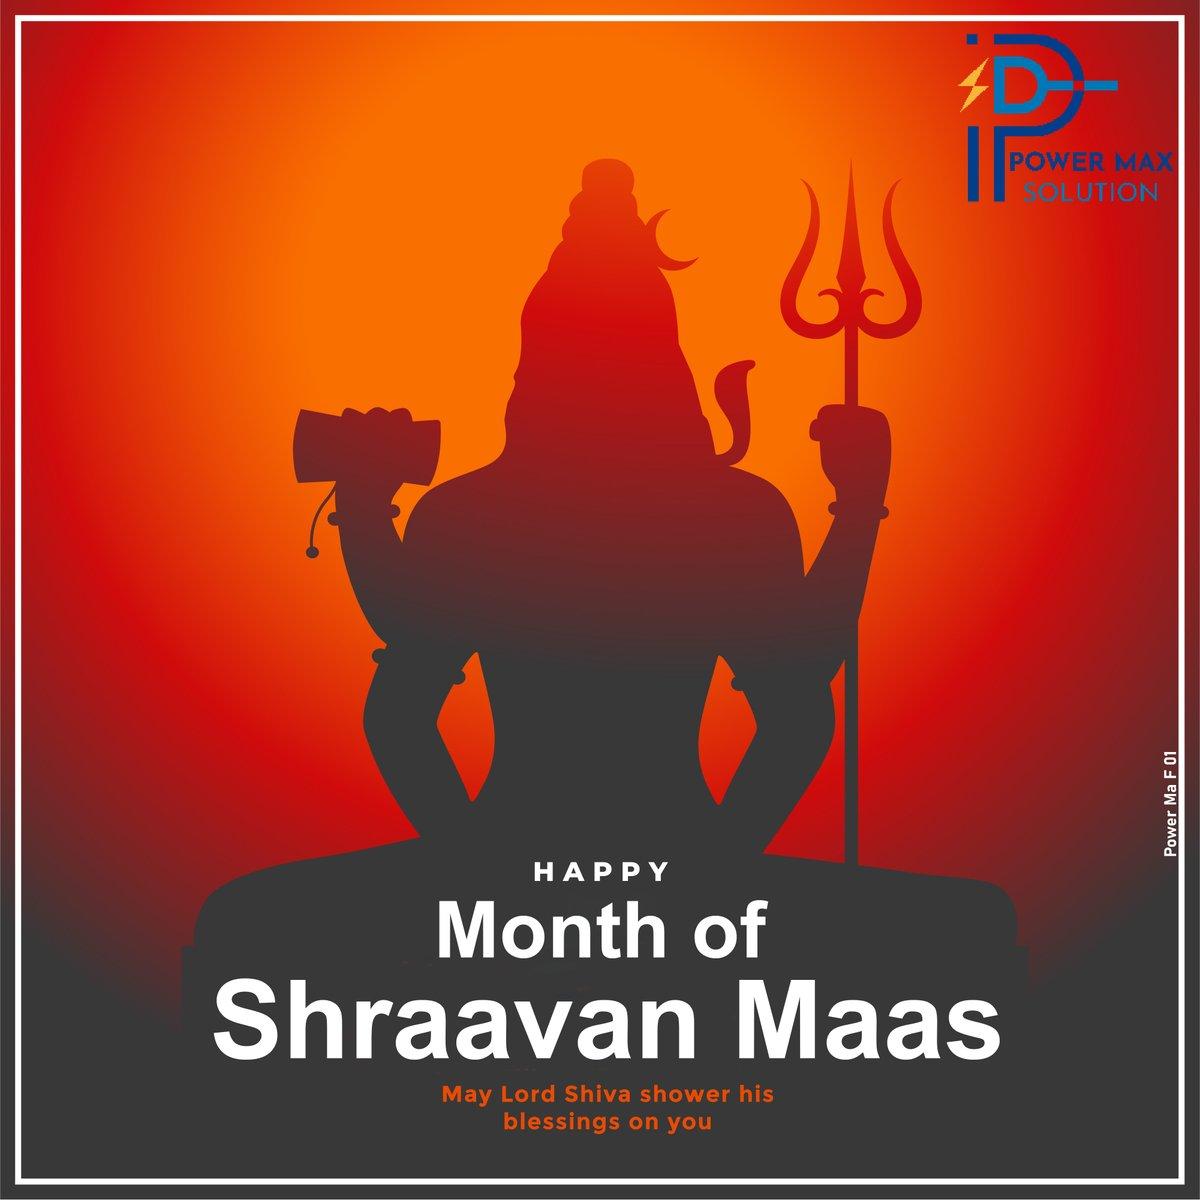 Wishes you #Happy Month of #Shraavan #Maas , May #Lord #Shiva Shower his #blessings on Us   #rainnyseason #monson #monsonvibes #sawaan https://t.co/99gm1N5LnR